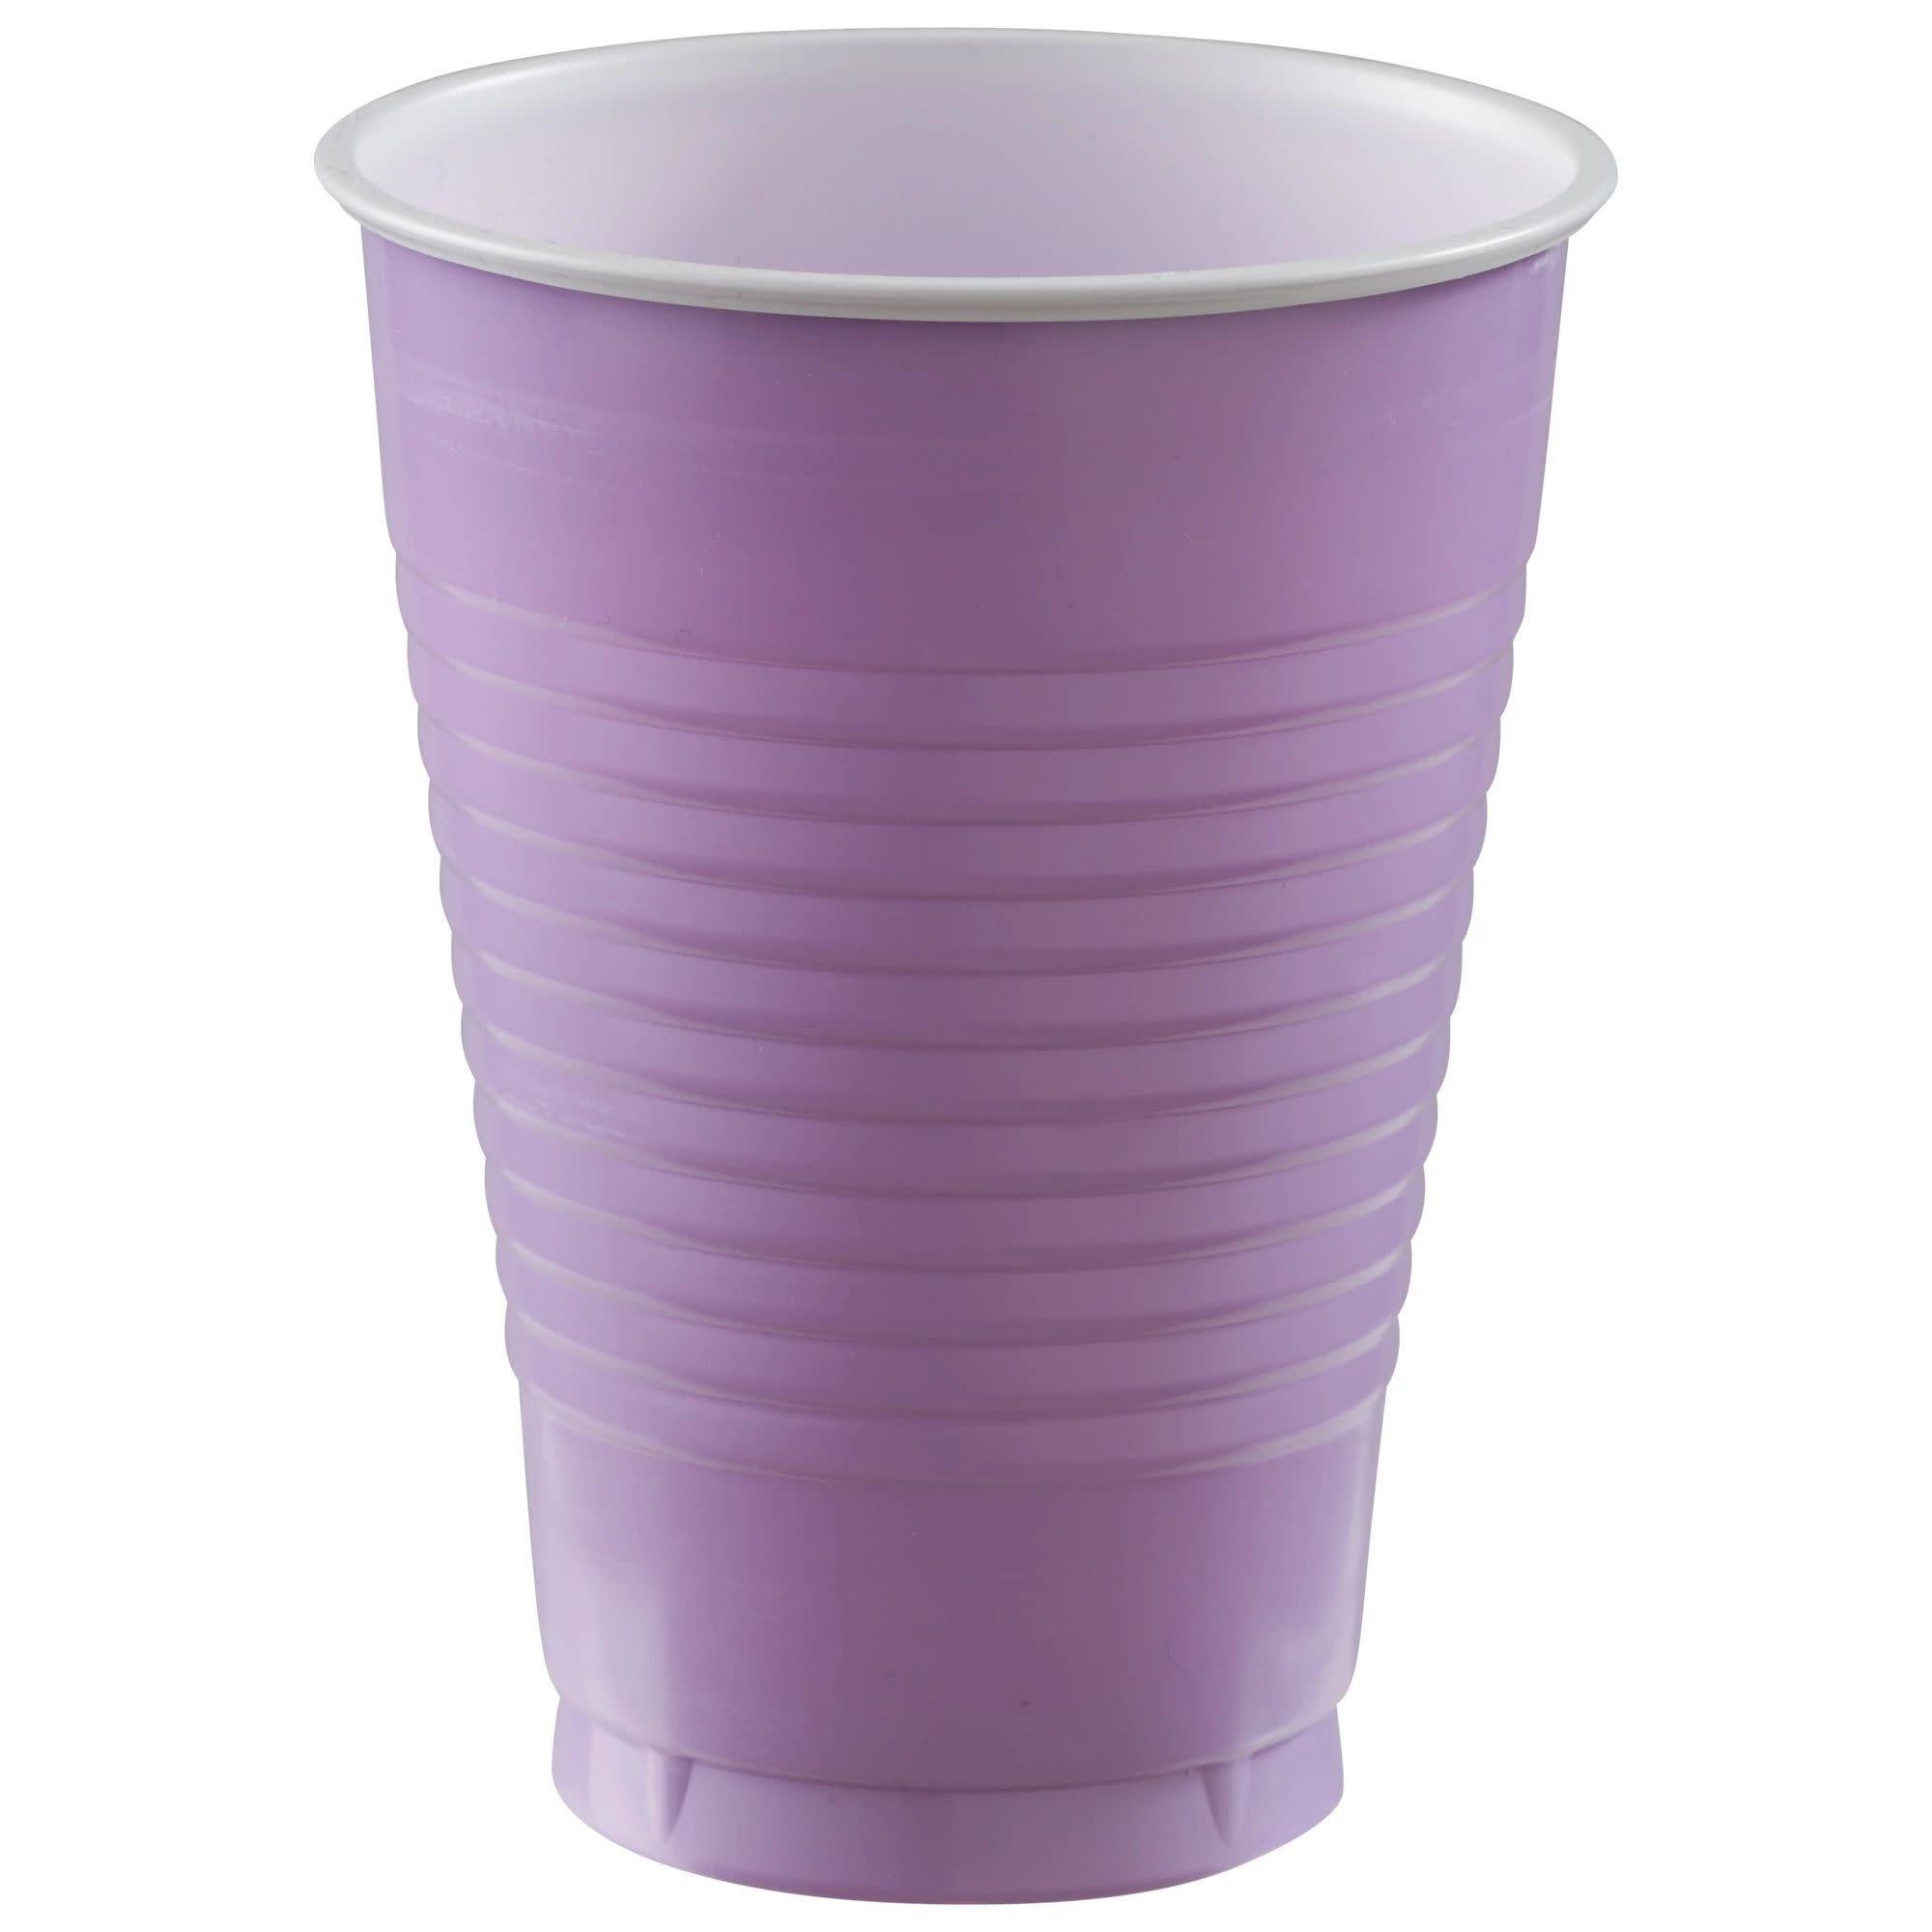 12 Oz. Plastic Cups, Mid Ct. - Lavender